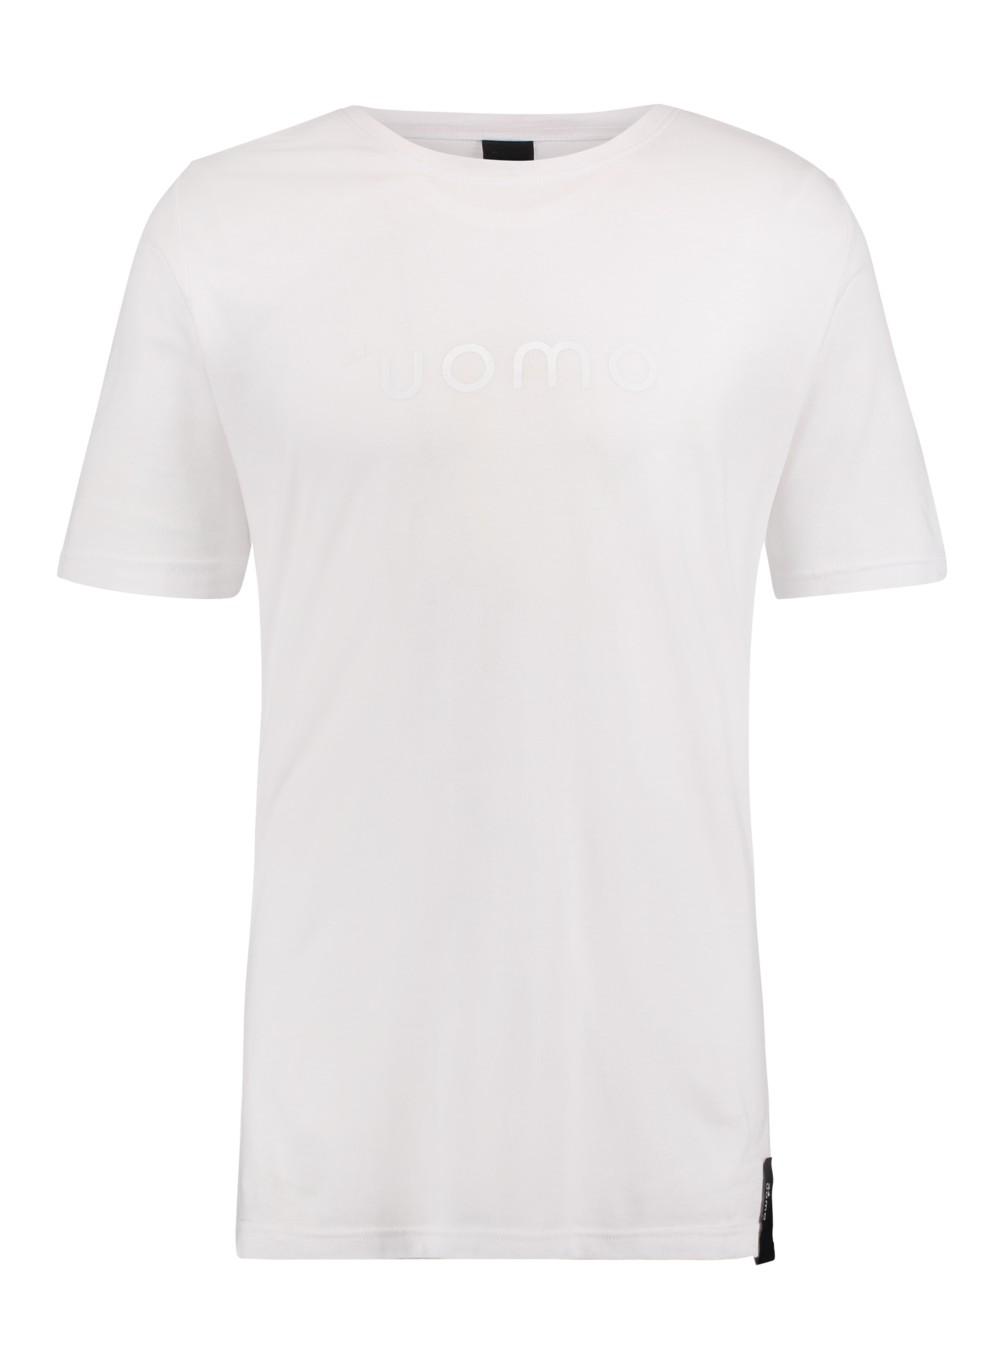 Afbeelding van 24UOMO 24 uomo my6 t-shirt – wit